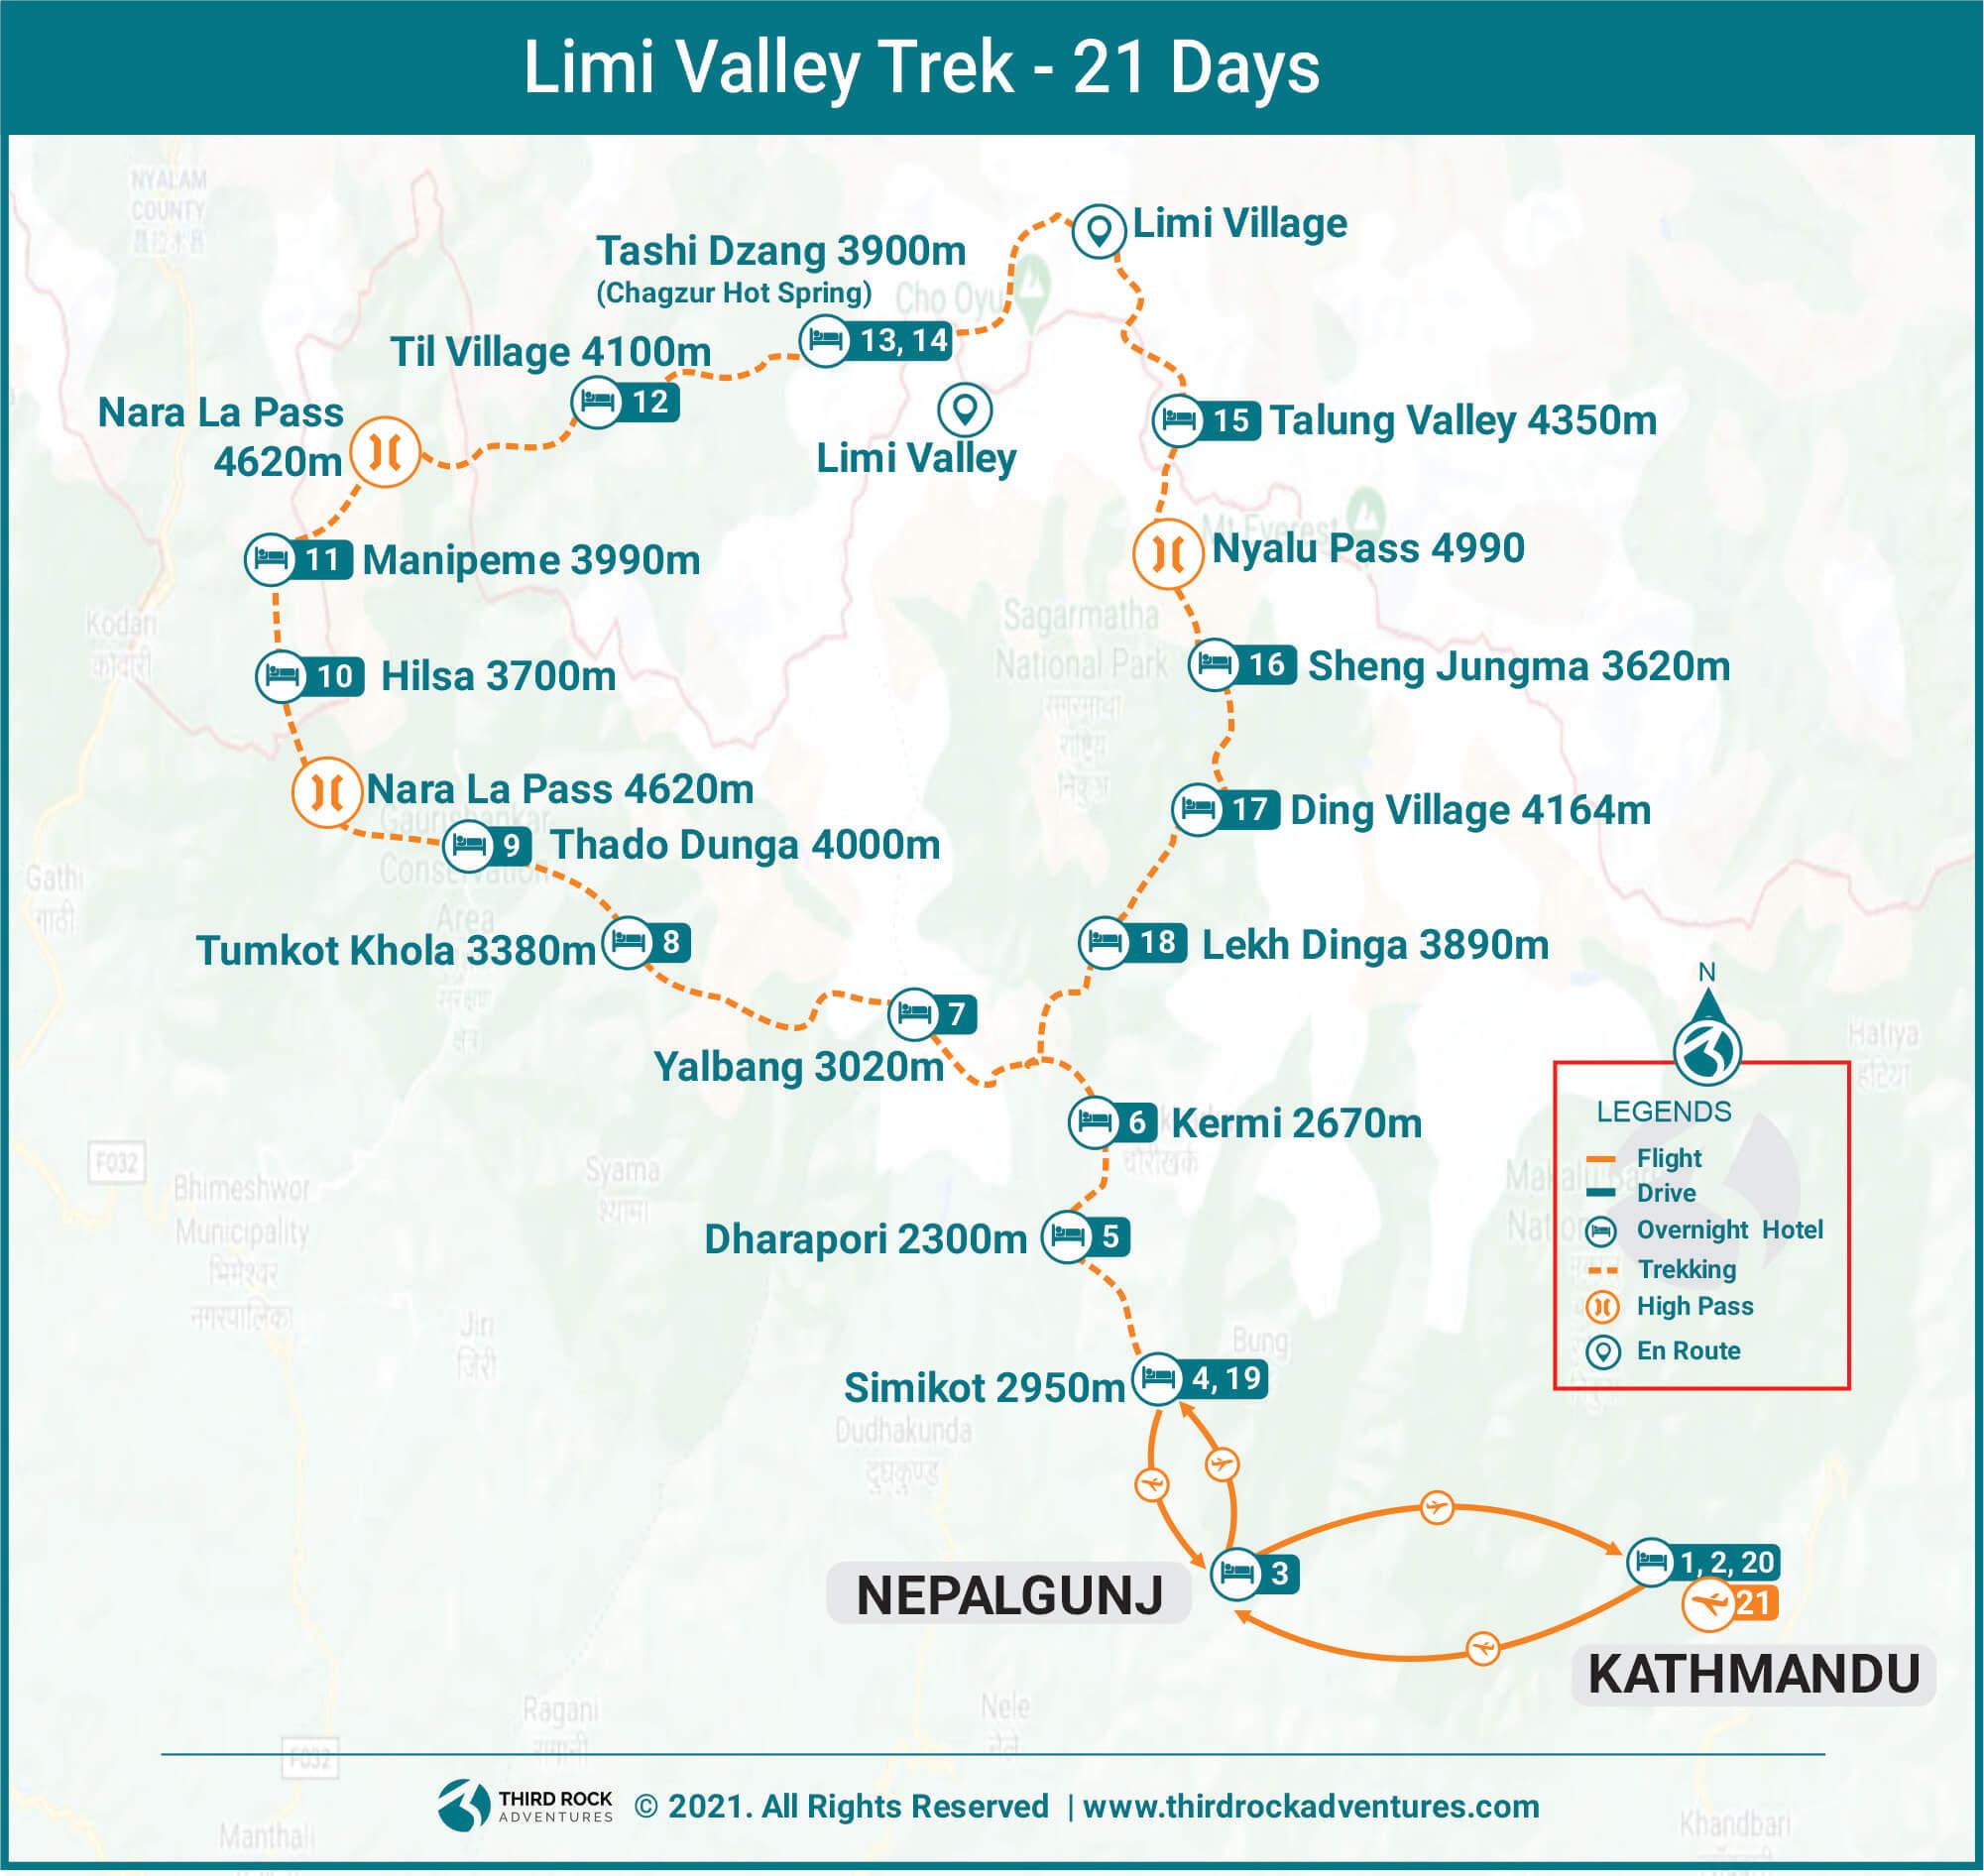 Limi Valley Trek Route Map